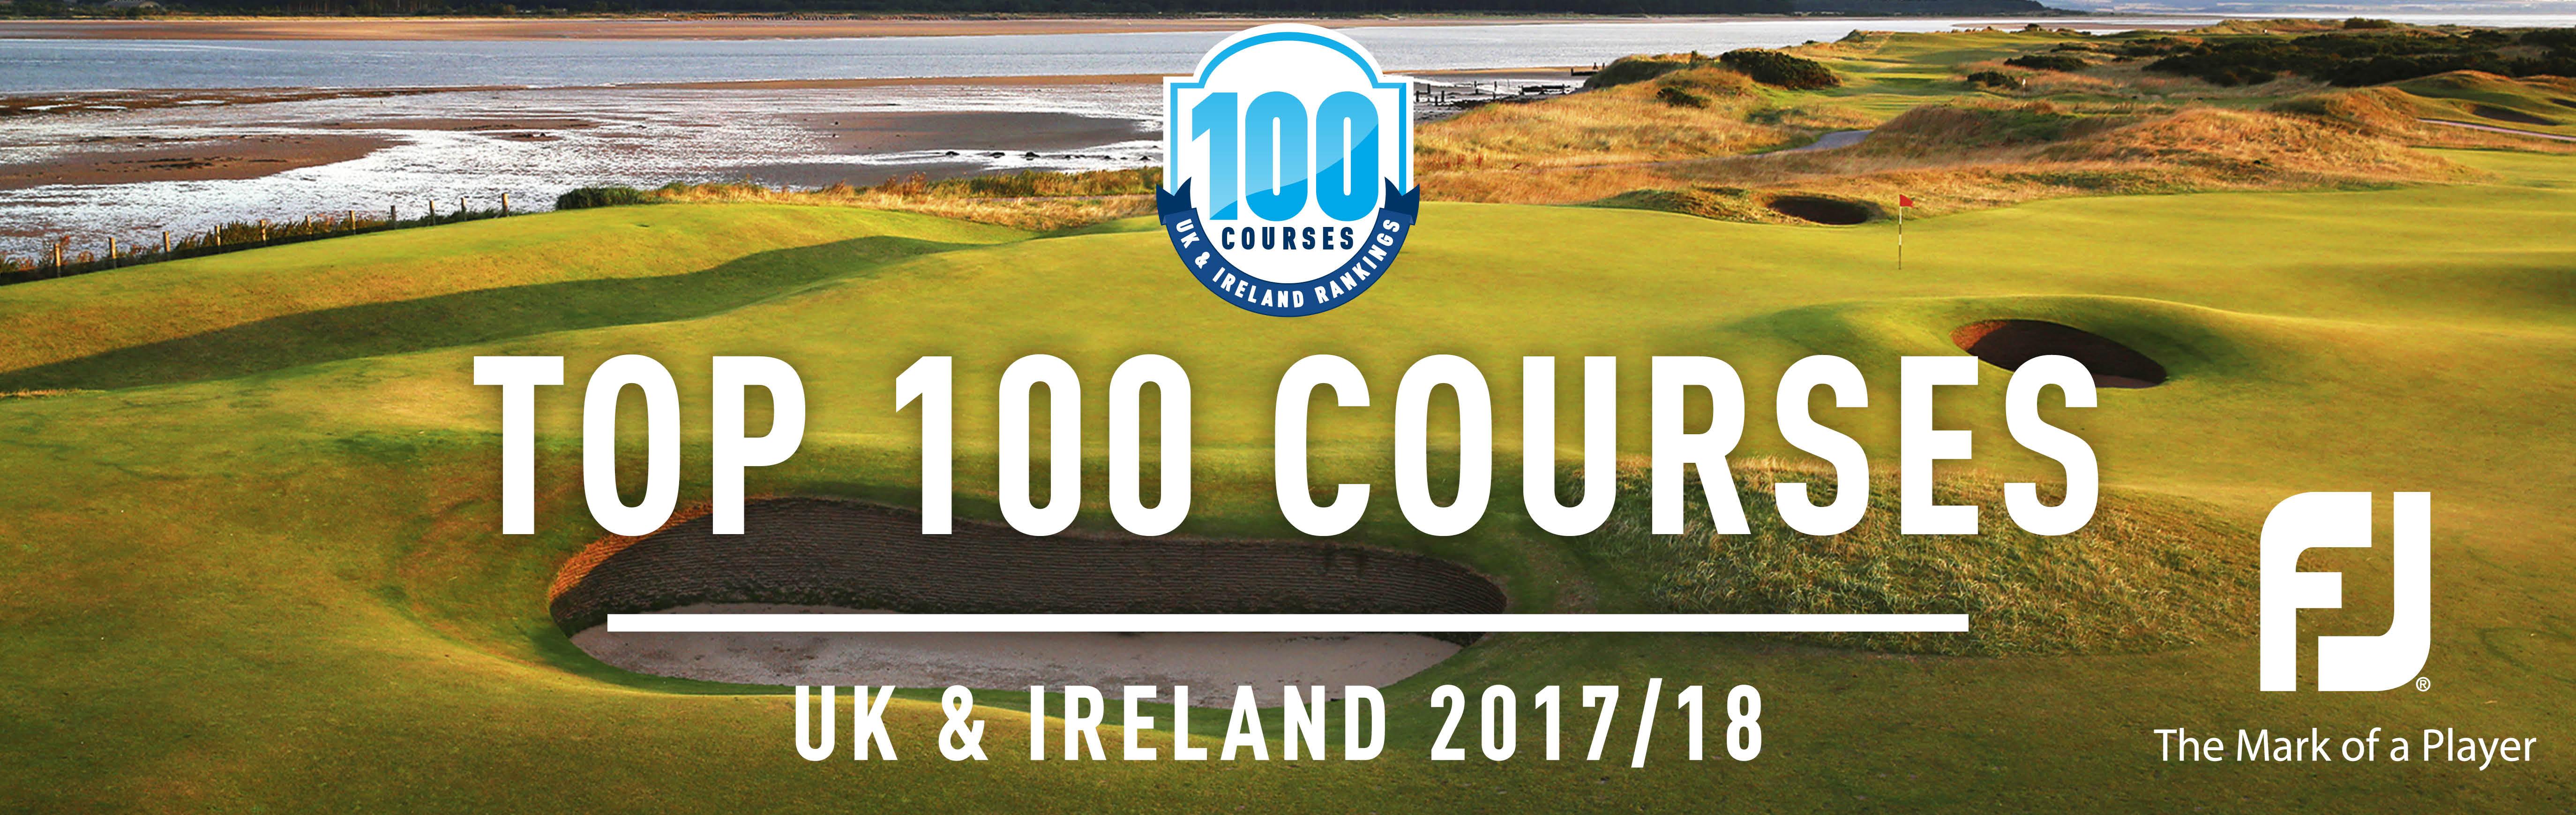 Top 100 Main Banner